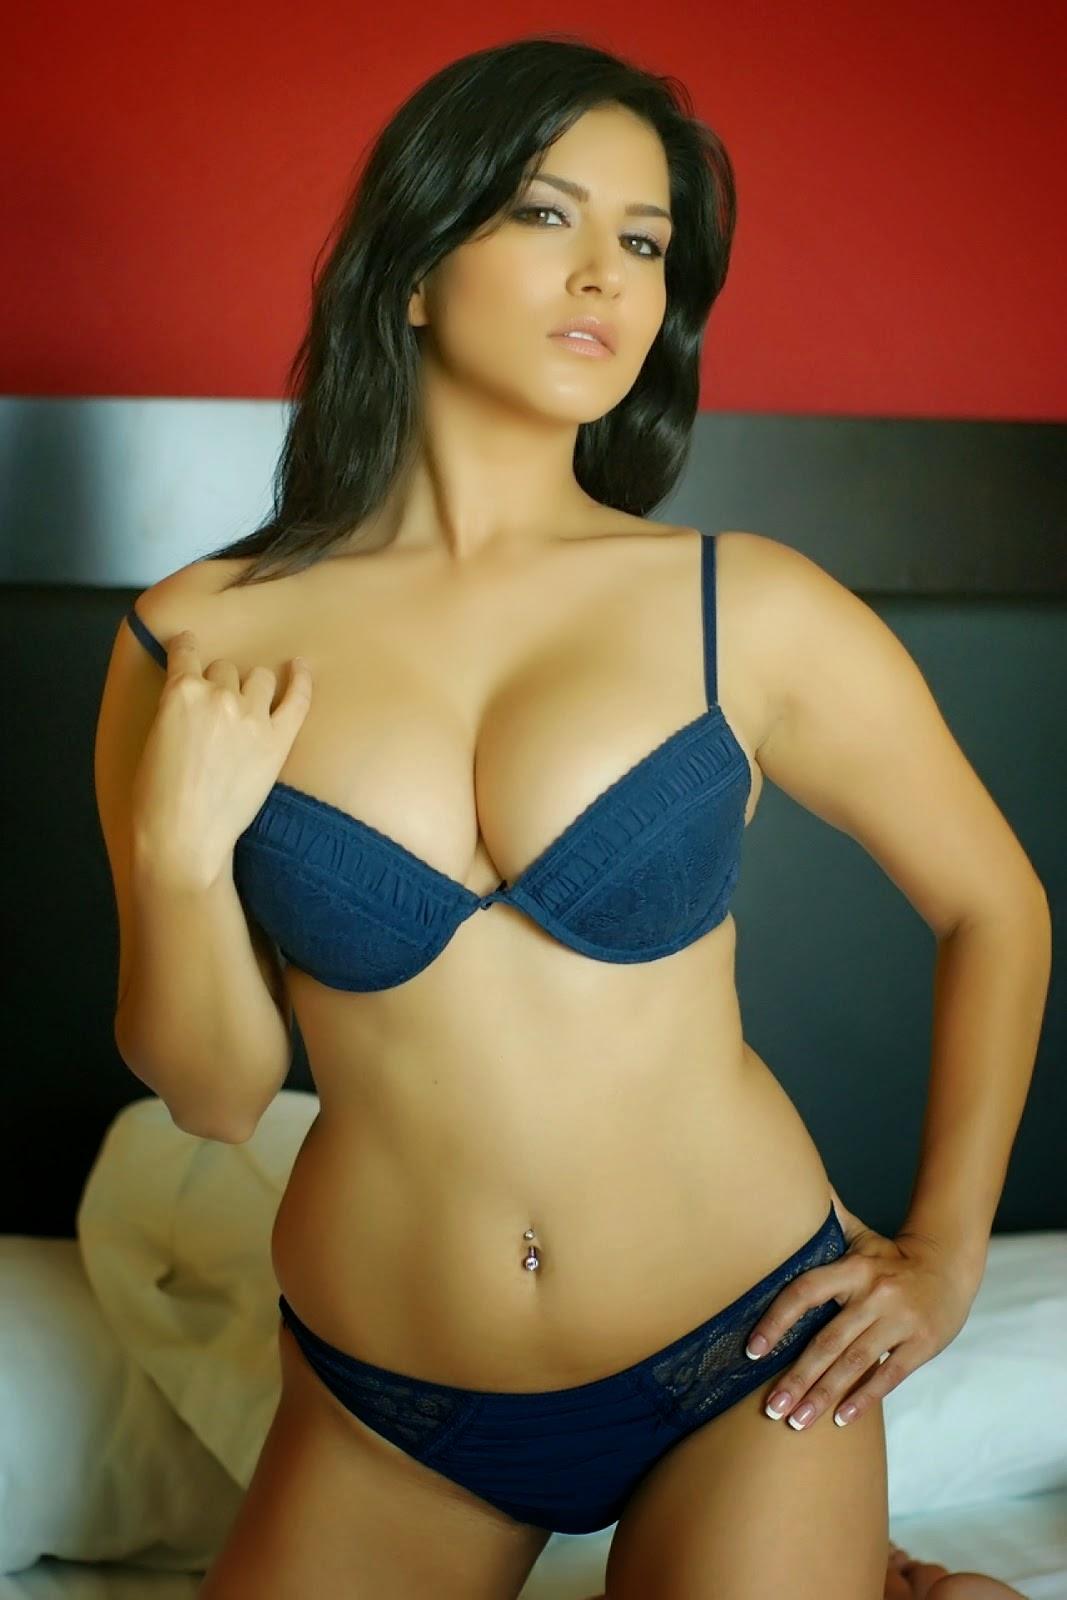 Sunny Leone Hot Images In Blue Bikini - Hot4Sure-1038